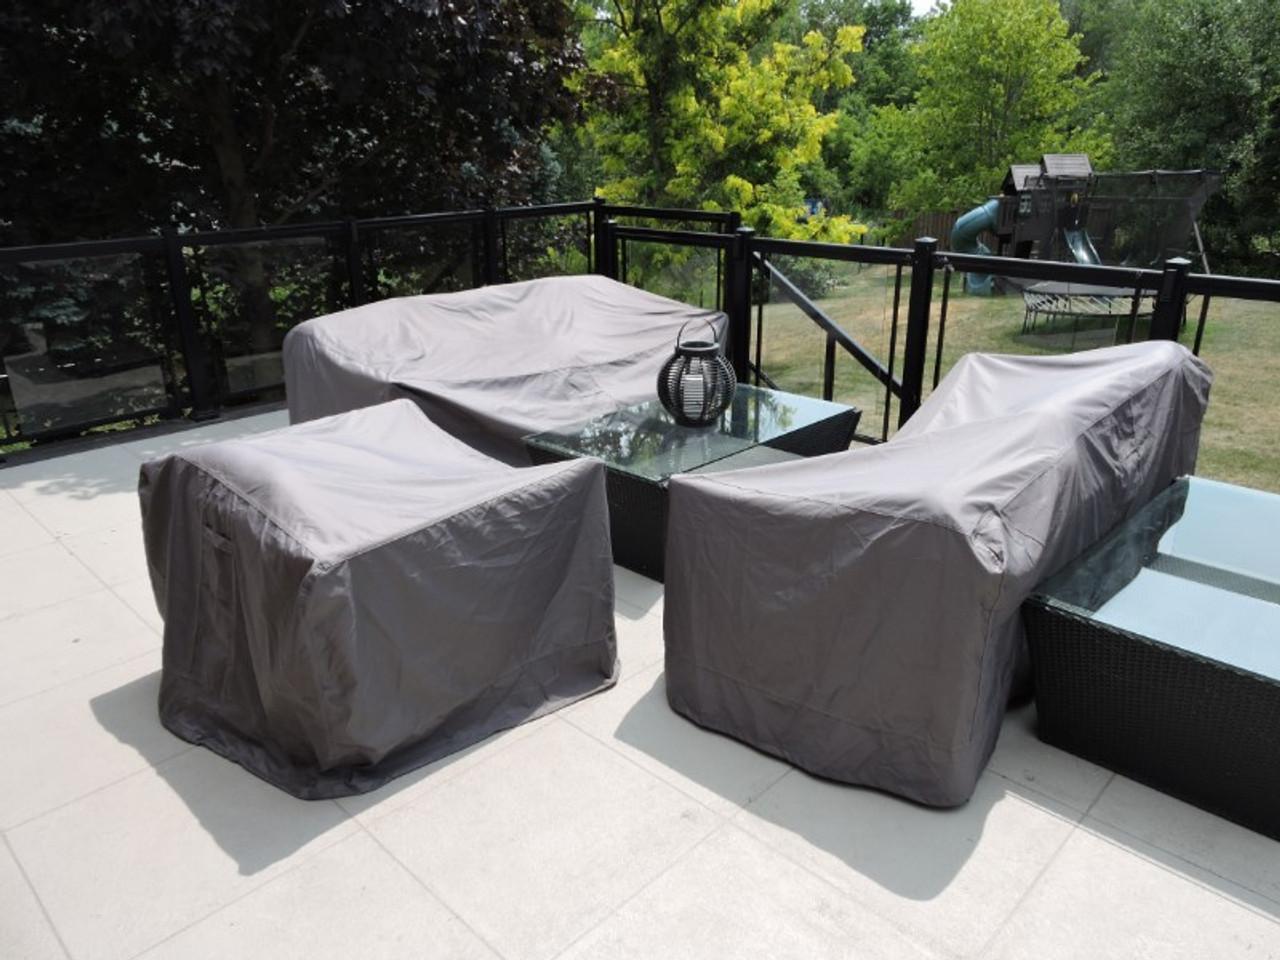 Deep Box Sofa Cover LG (94Wx40Dx28H) (Avalon #51594)